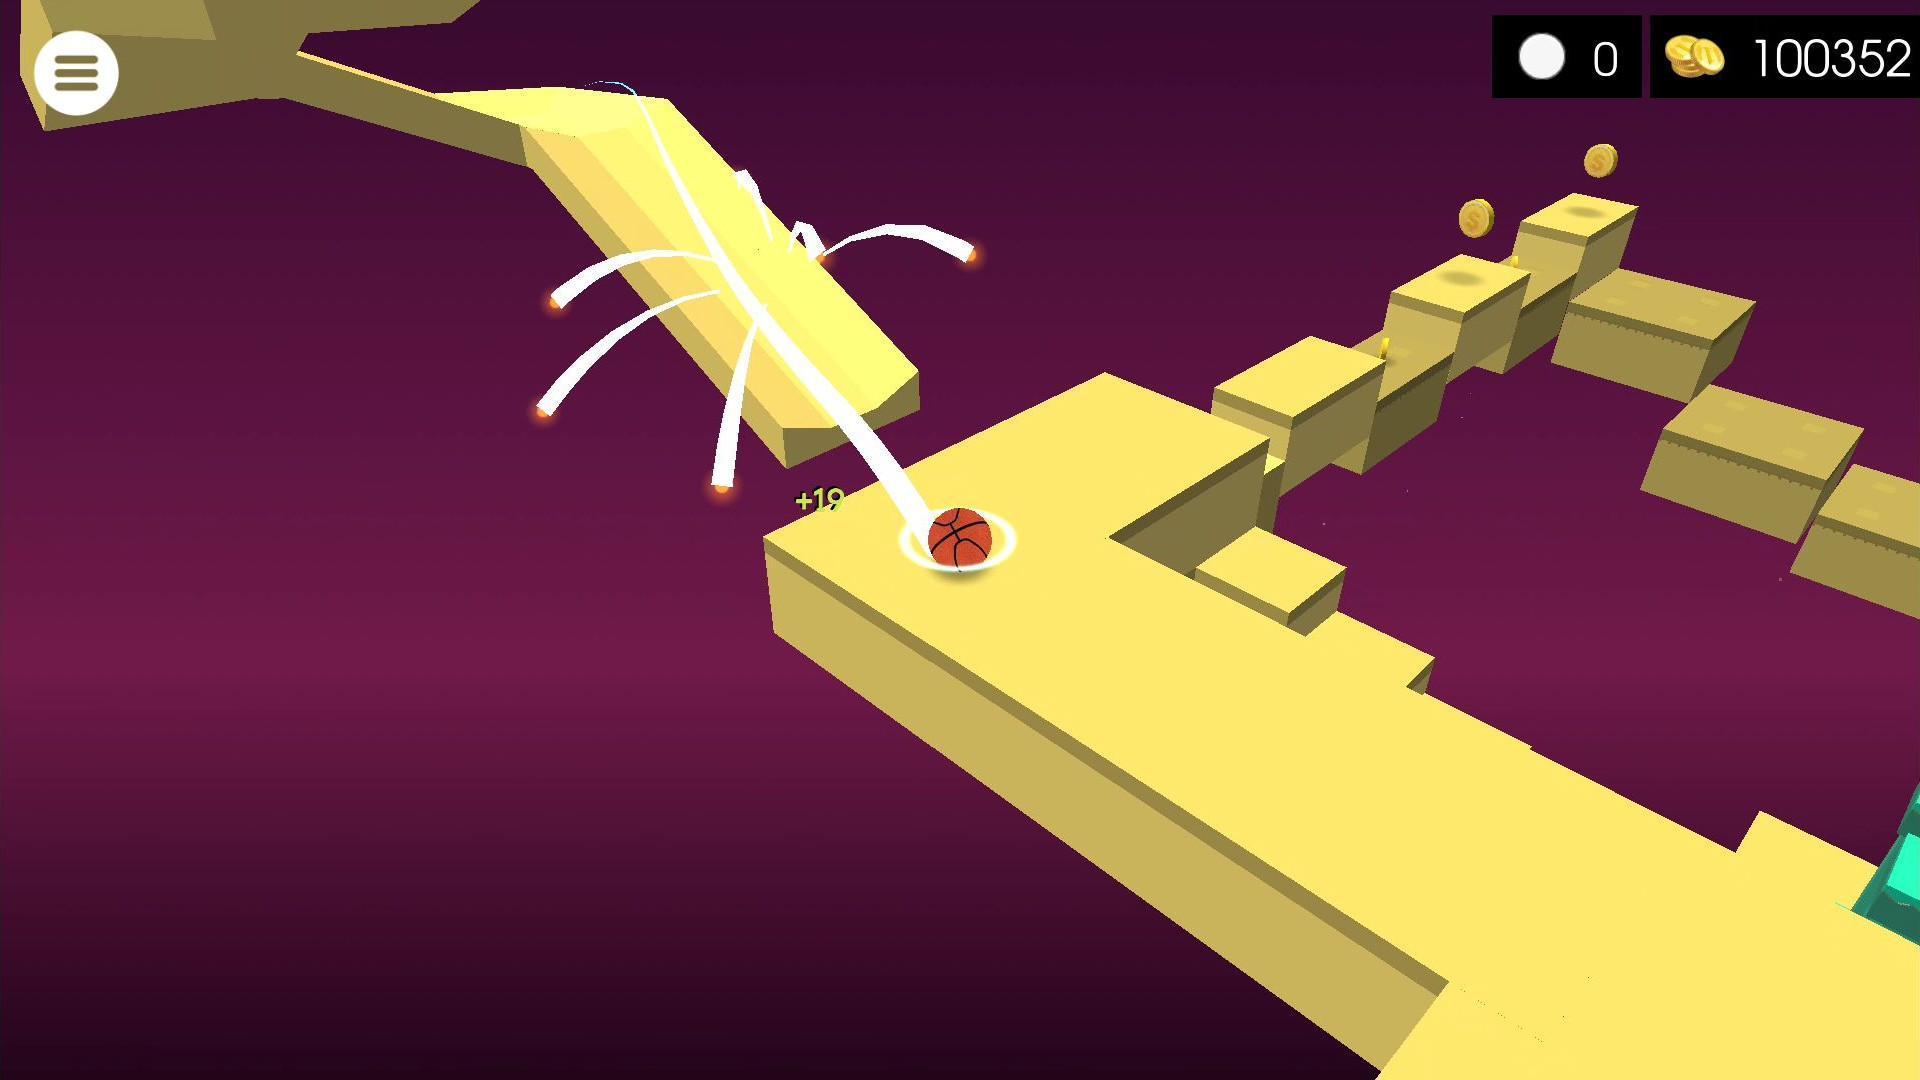 RYWO free 3D roll ball game 1.2.3 Screenshot 20